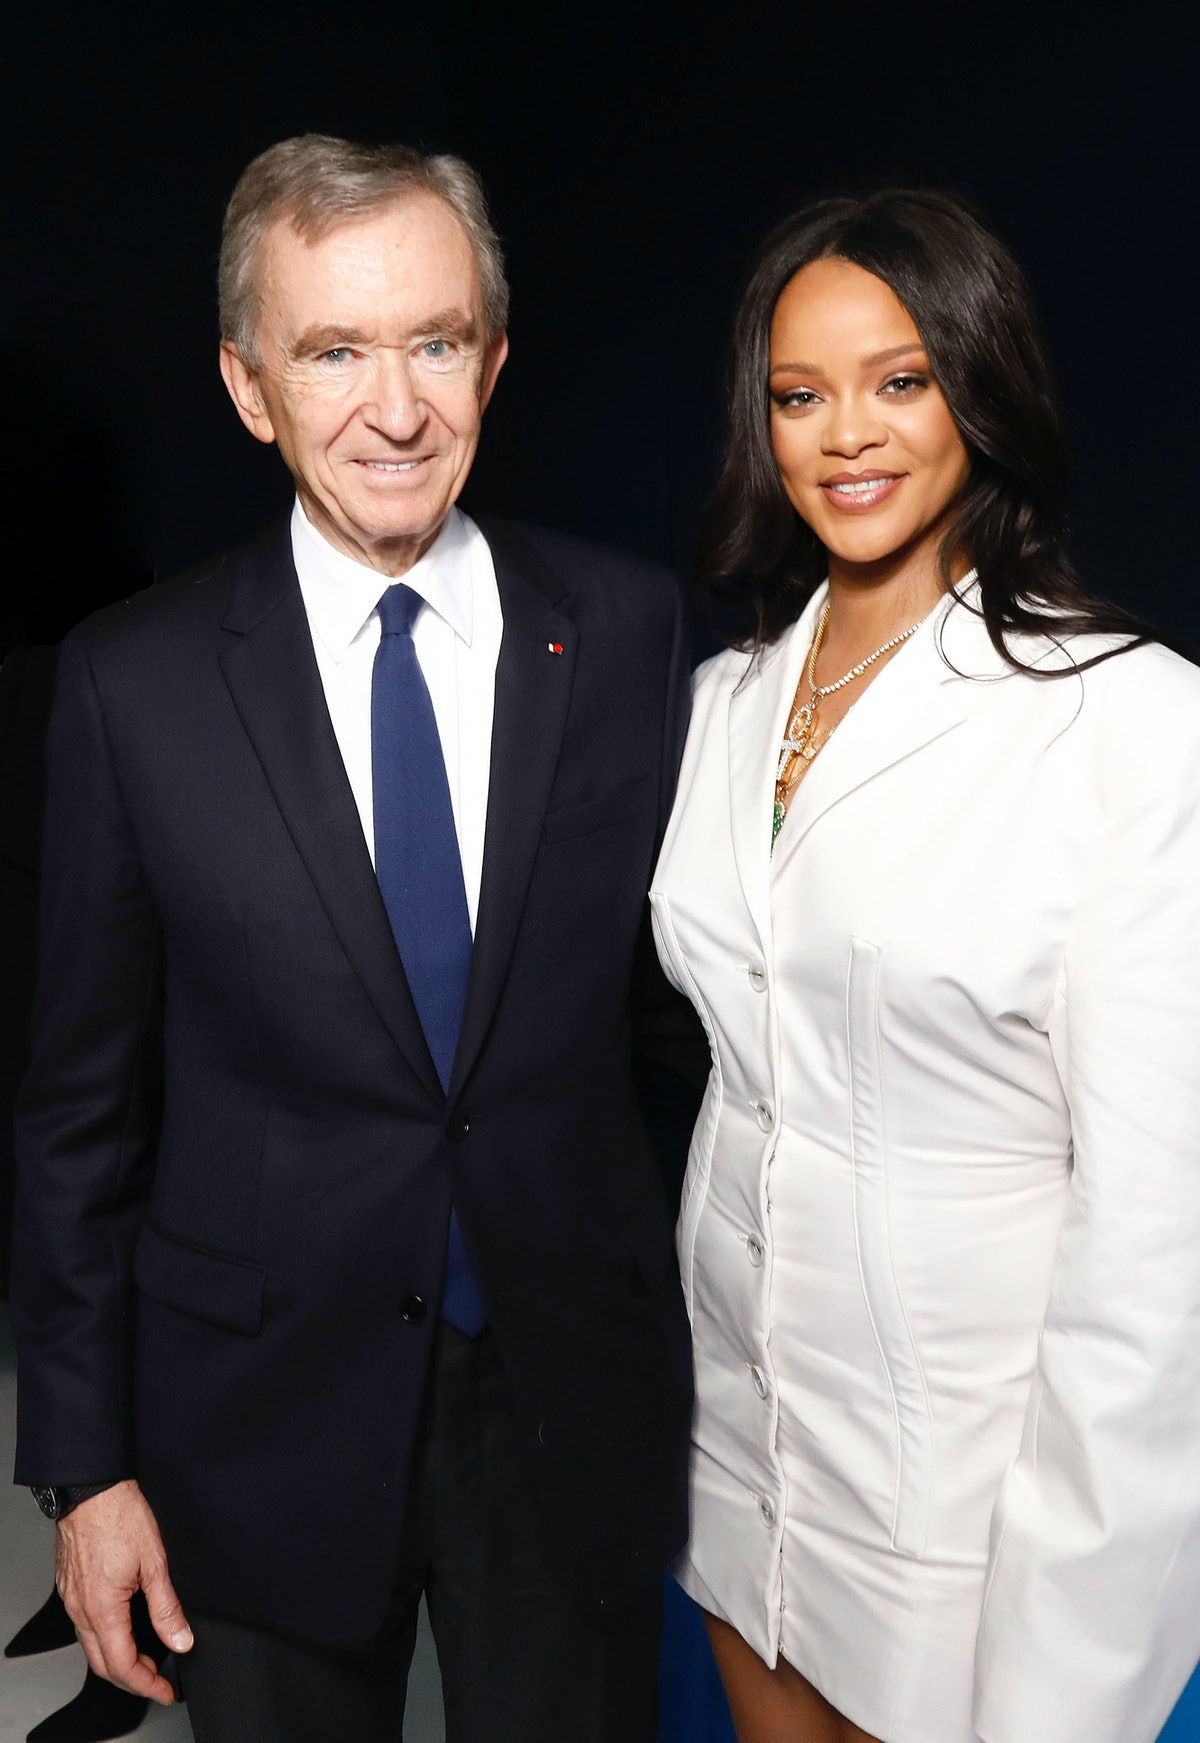 Bernard Arnault and Rihanna